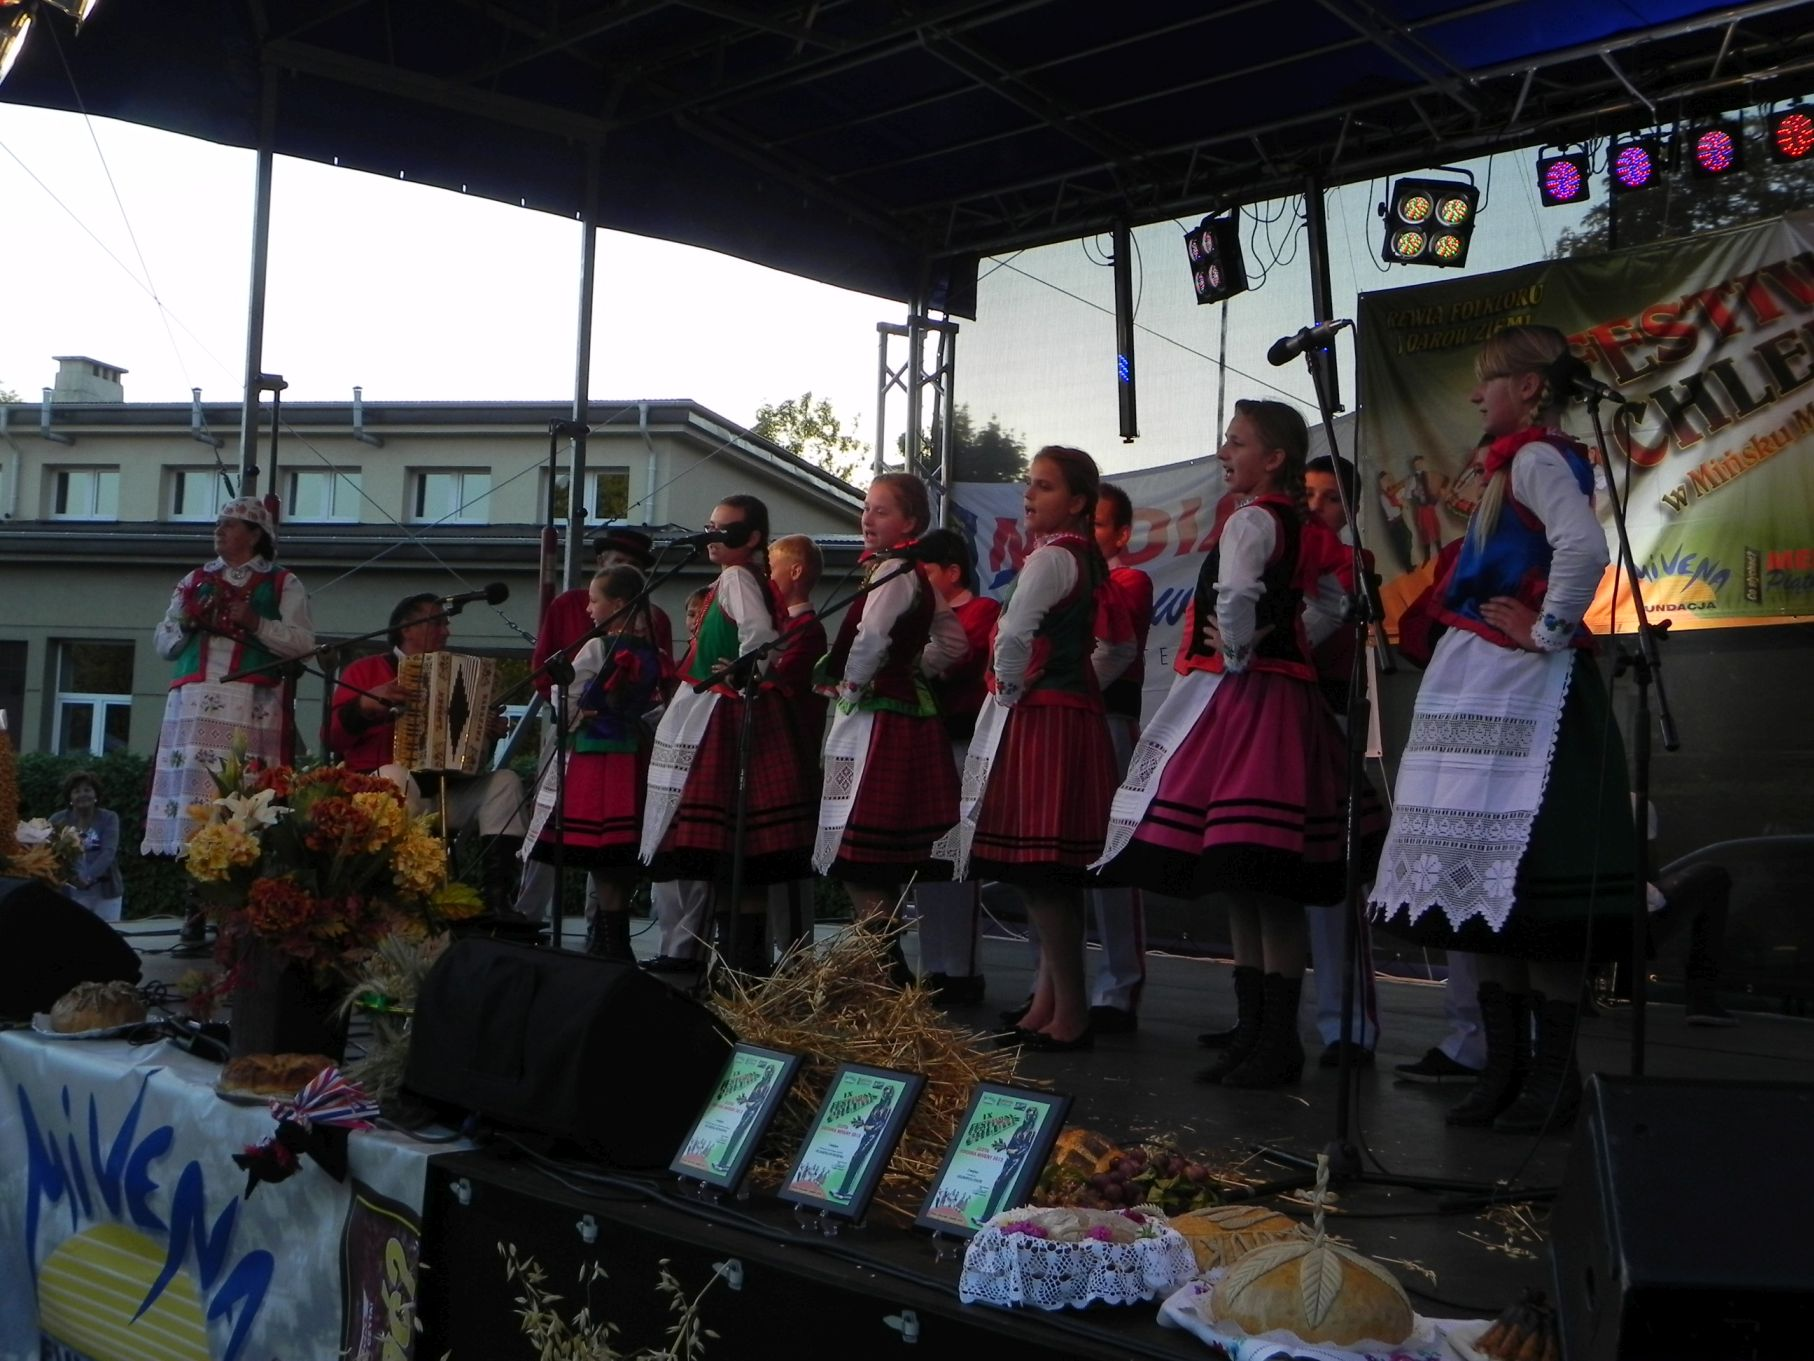 2013-09-10 Festyn - Mińsk Maz (159)